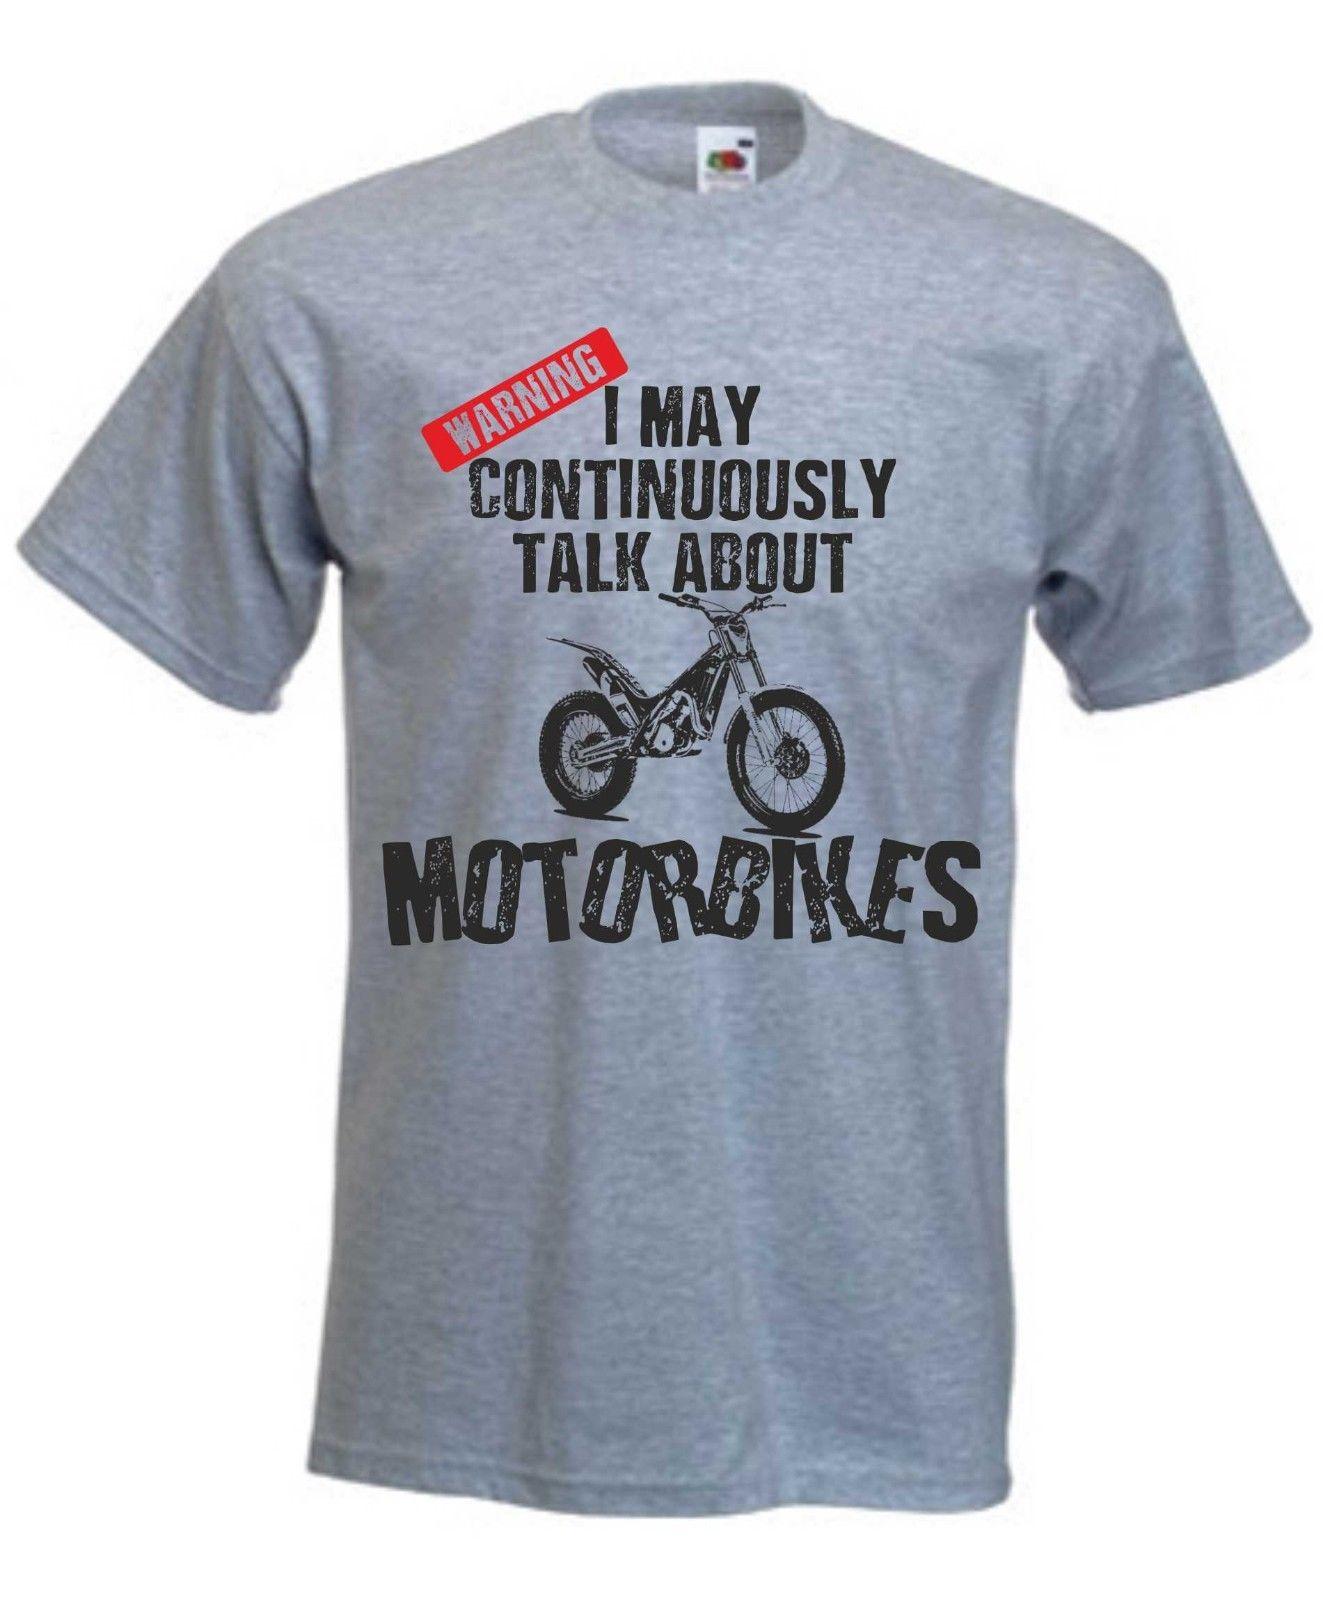 Motorbike Motocross Trial Trail Dirt Biking T Shirt Top TShirt Size S XXXL New T Shirts Funny Tops Tee in T Shirts from Men 39 s Clothing